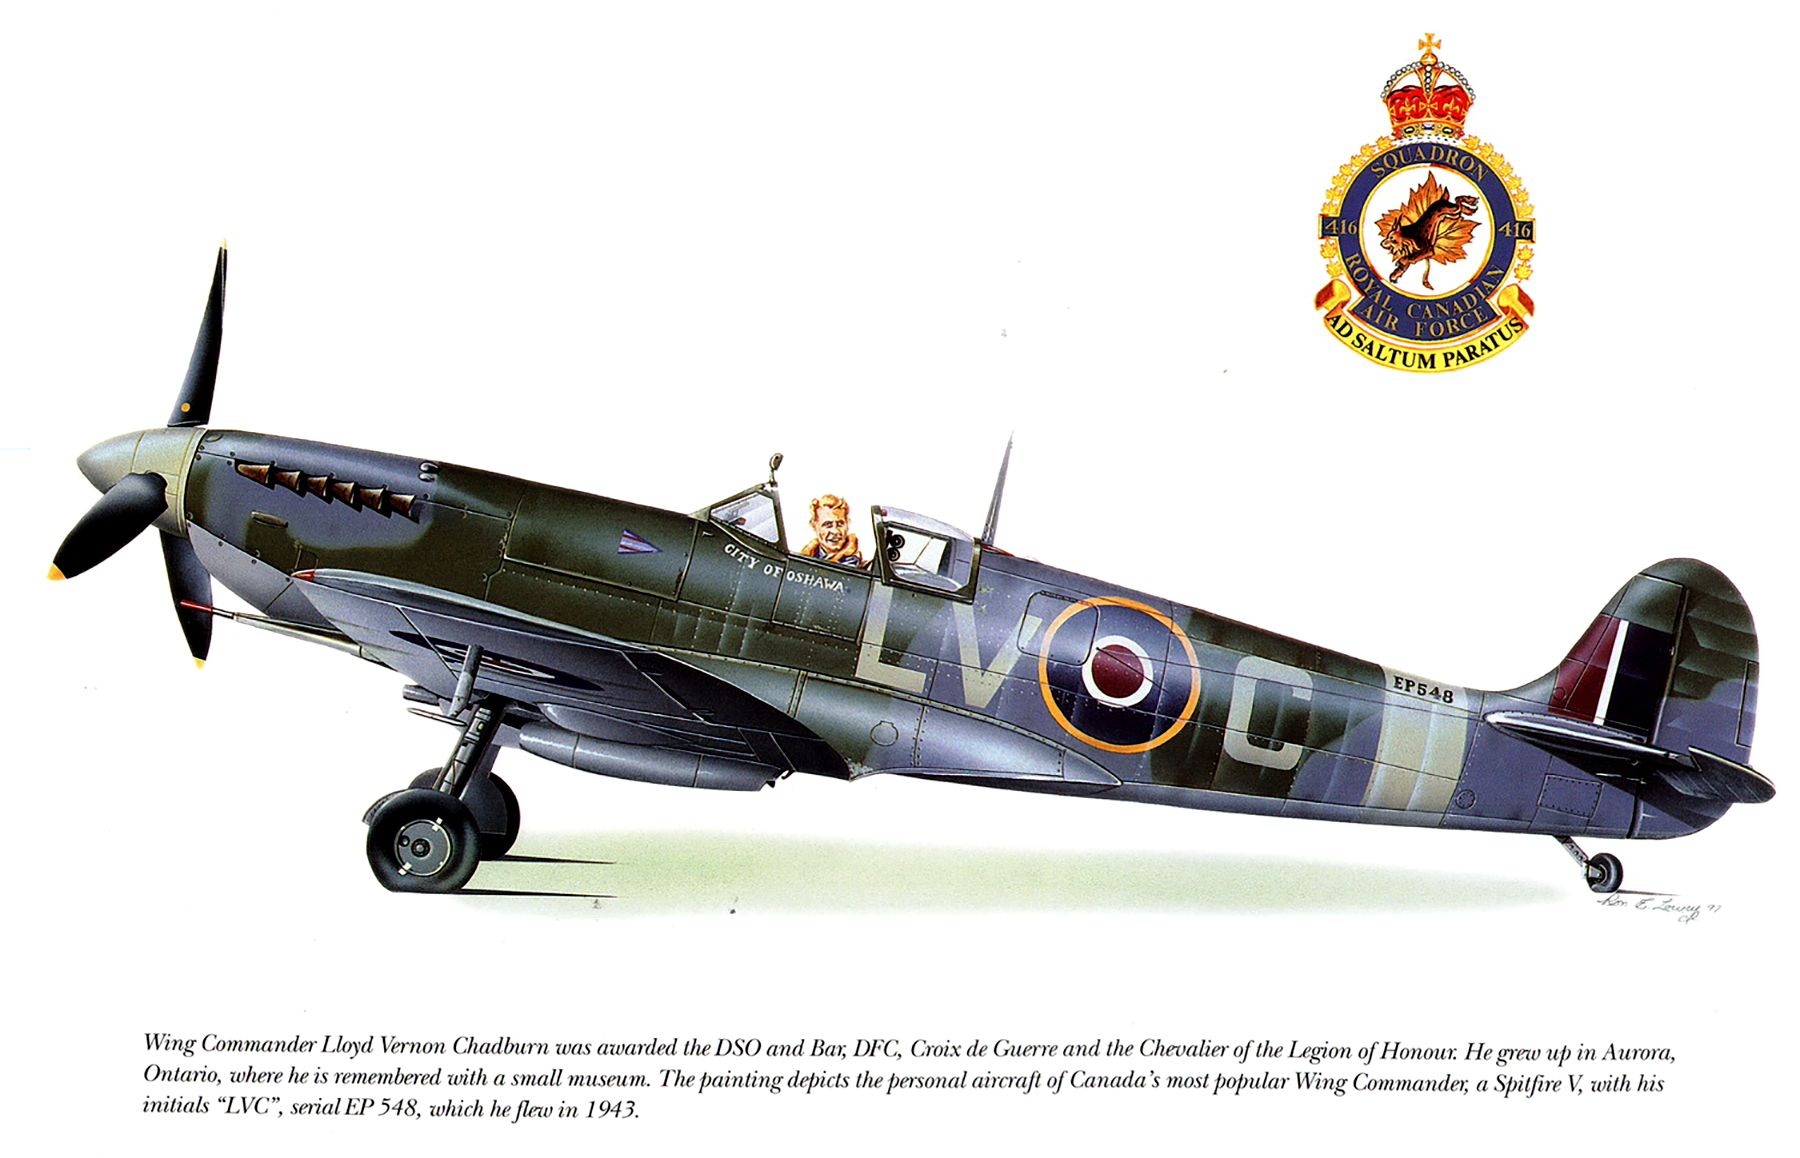 Spitfire MkVb RCAF 416Sqn LVC Lloyd Vernon Chadburn EP548 1943 0A